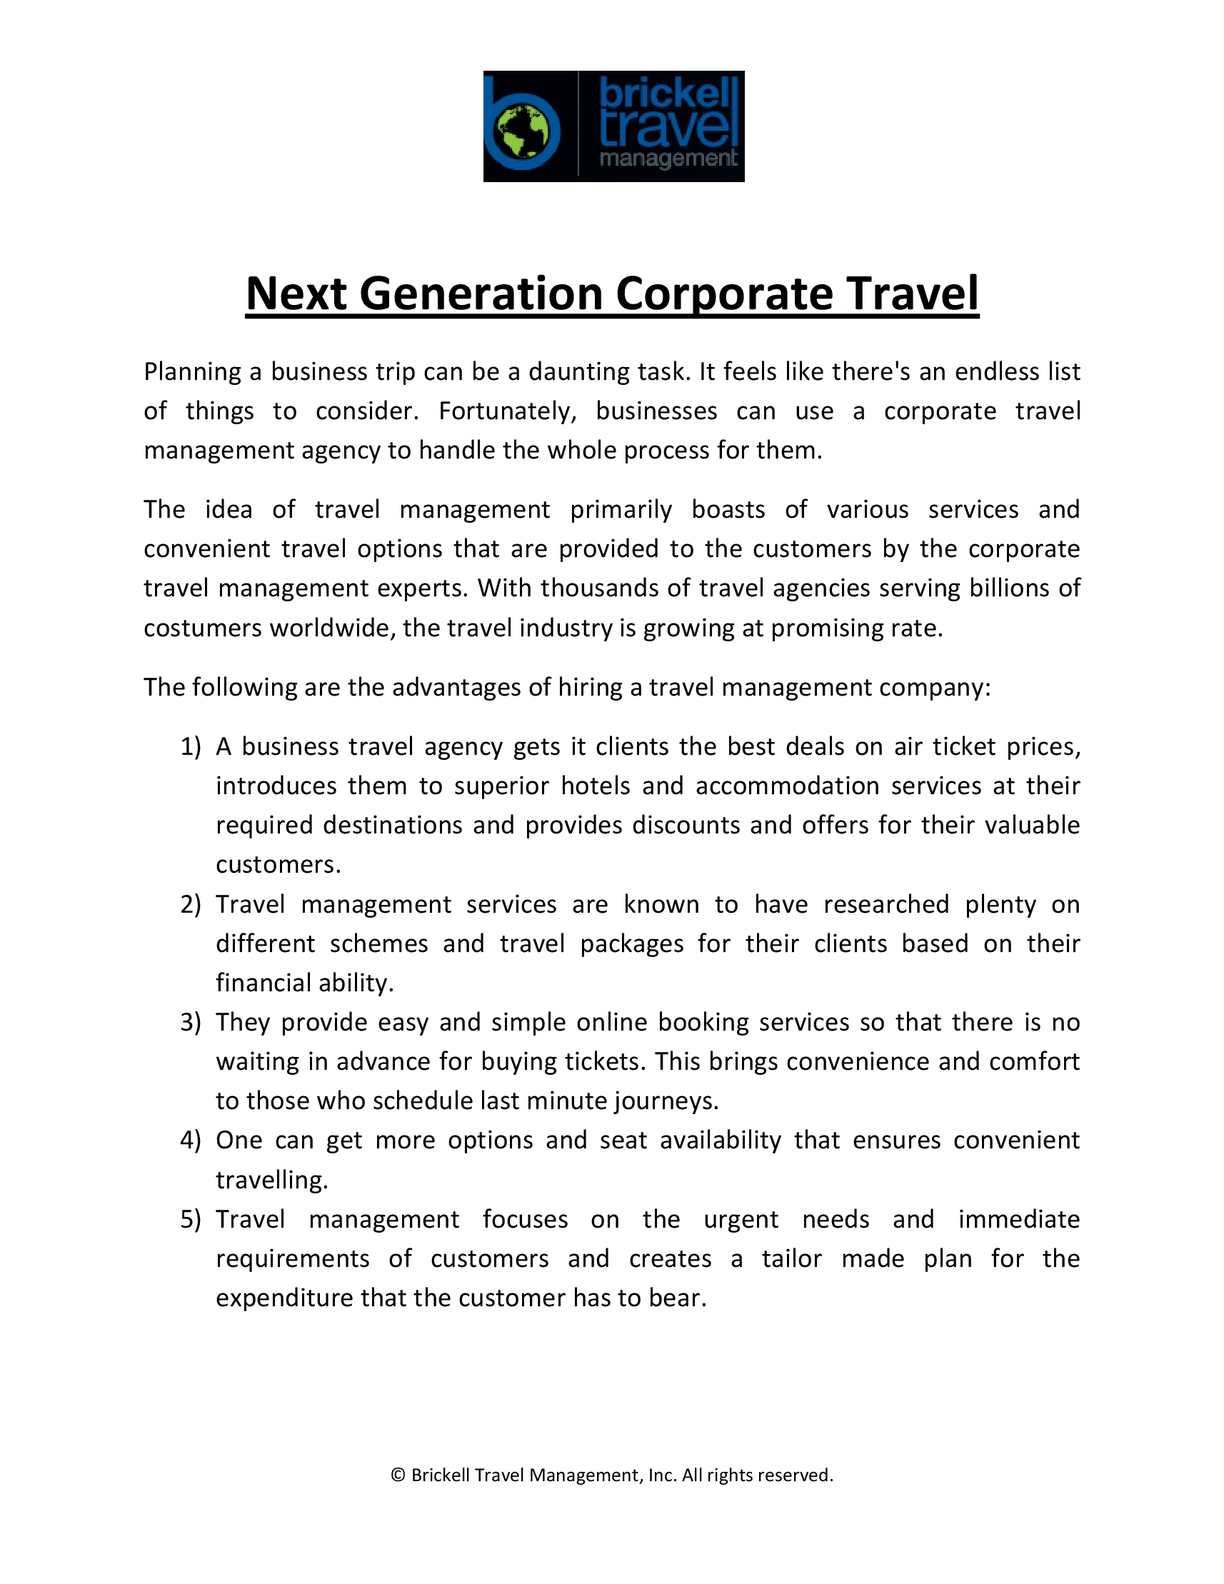 Calaméo - Next Generation Corporate Travel